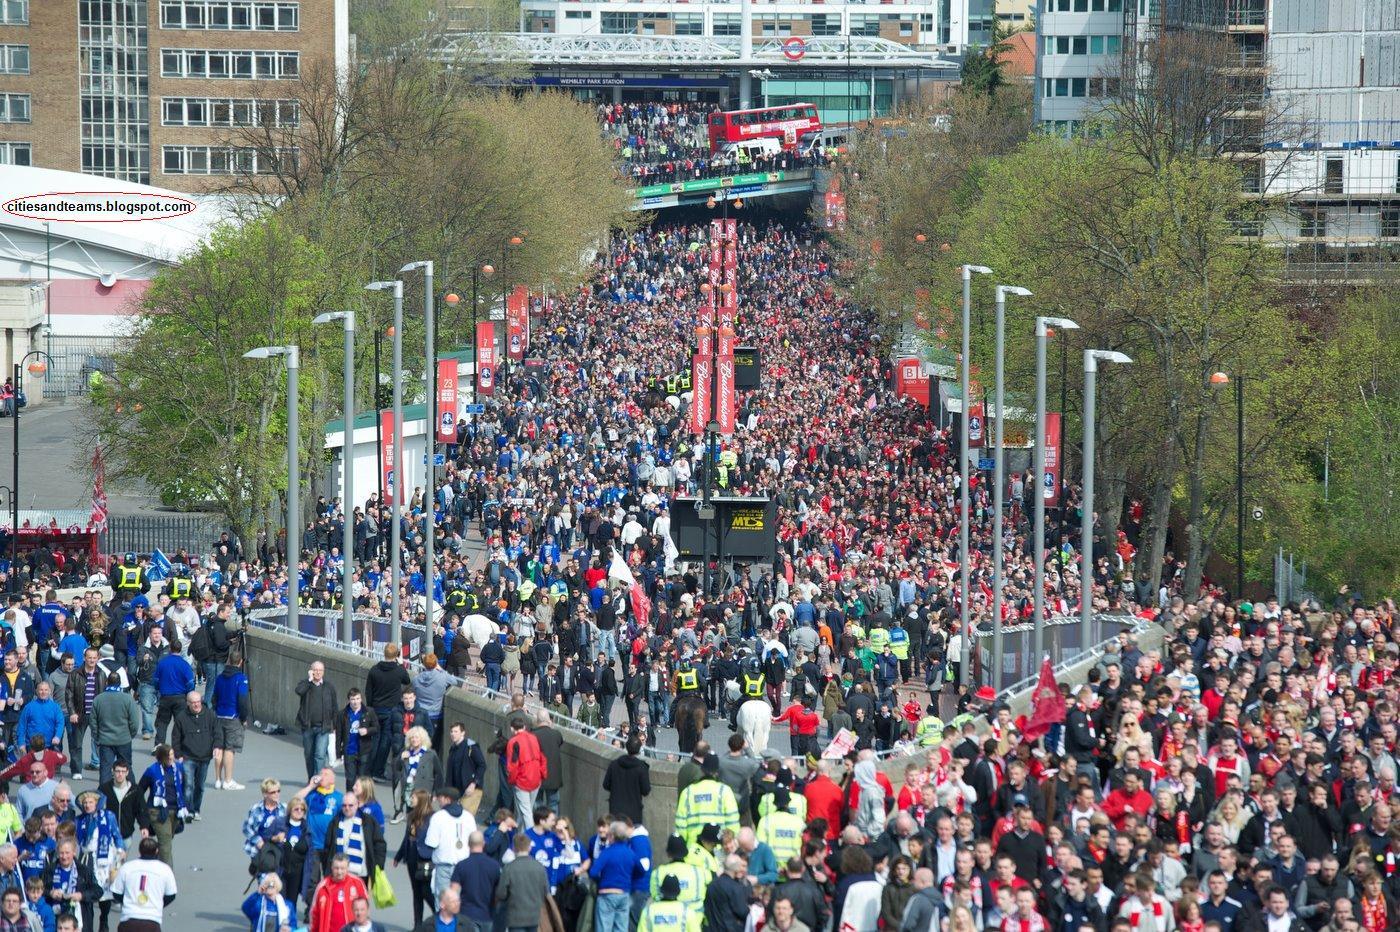 http://4.bp.blogspot.com/-6UYsIpnUeAA/T4luwPGZNwI/AAAAAAAAF_o/8GcePIEIj2s/s1600/Wembley_Way_Liverpool_Everton_Derby_England_English_United_Kingdom_Fa_Cup_Wallpaper_Desktop_citiesandteams.blogspot.com.jpg